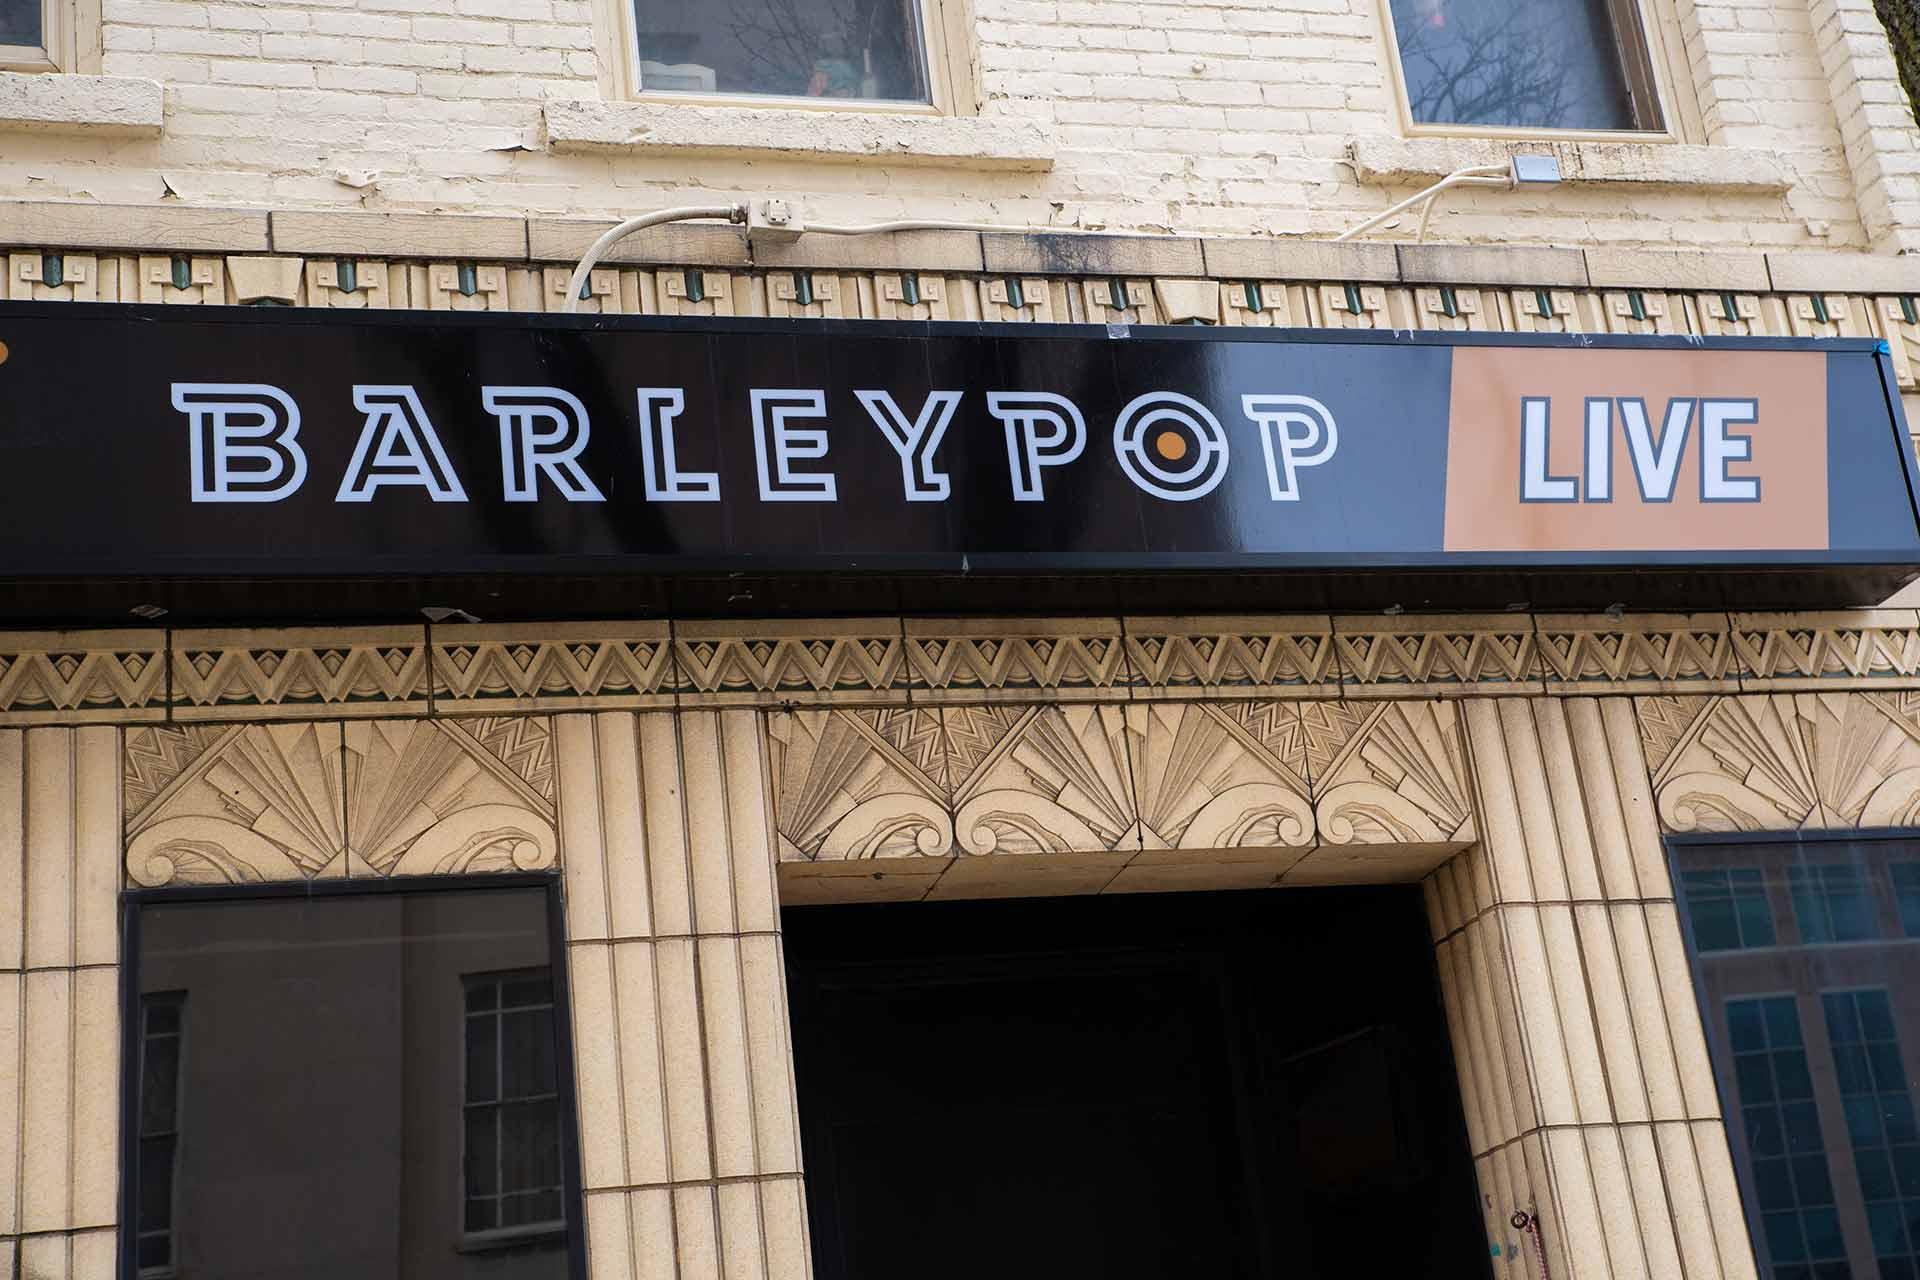 Exterior of BarleyPop Live